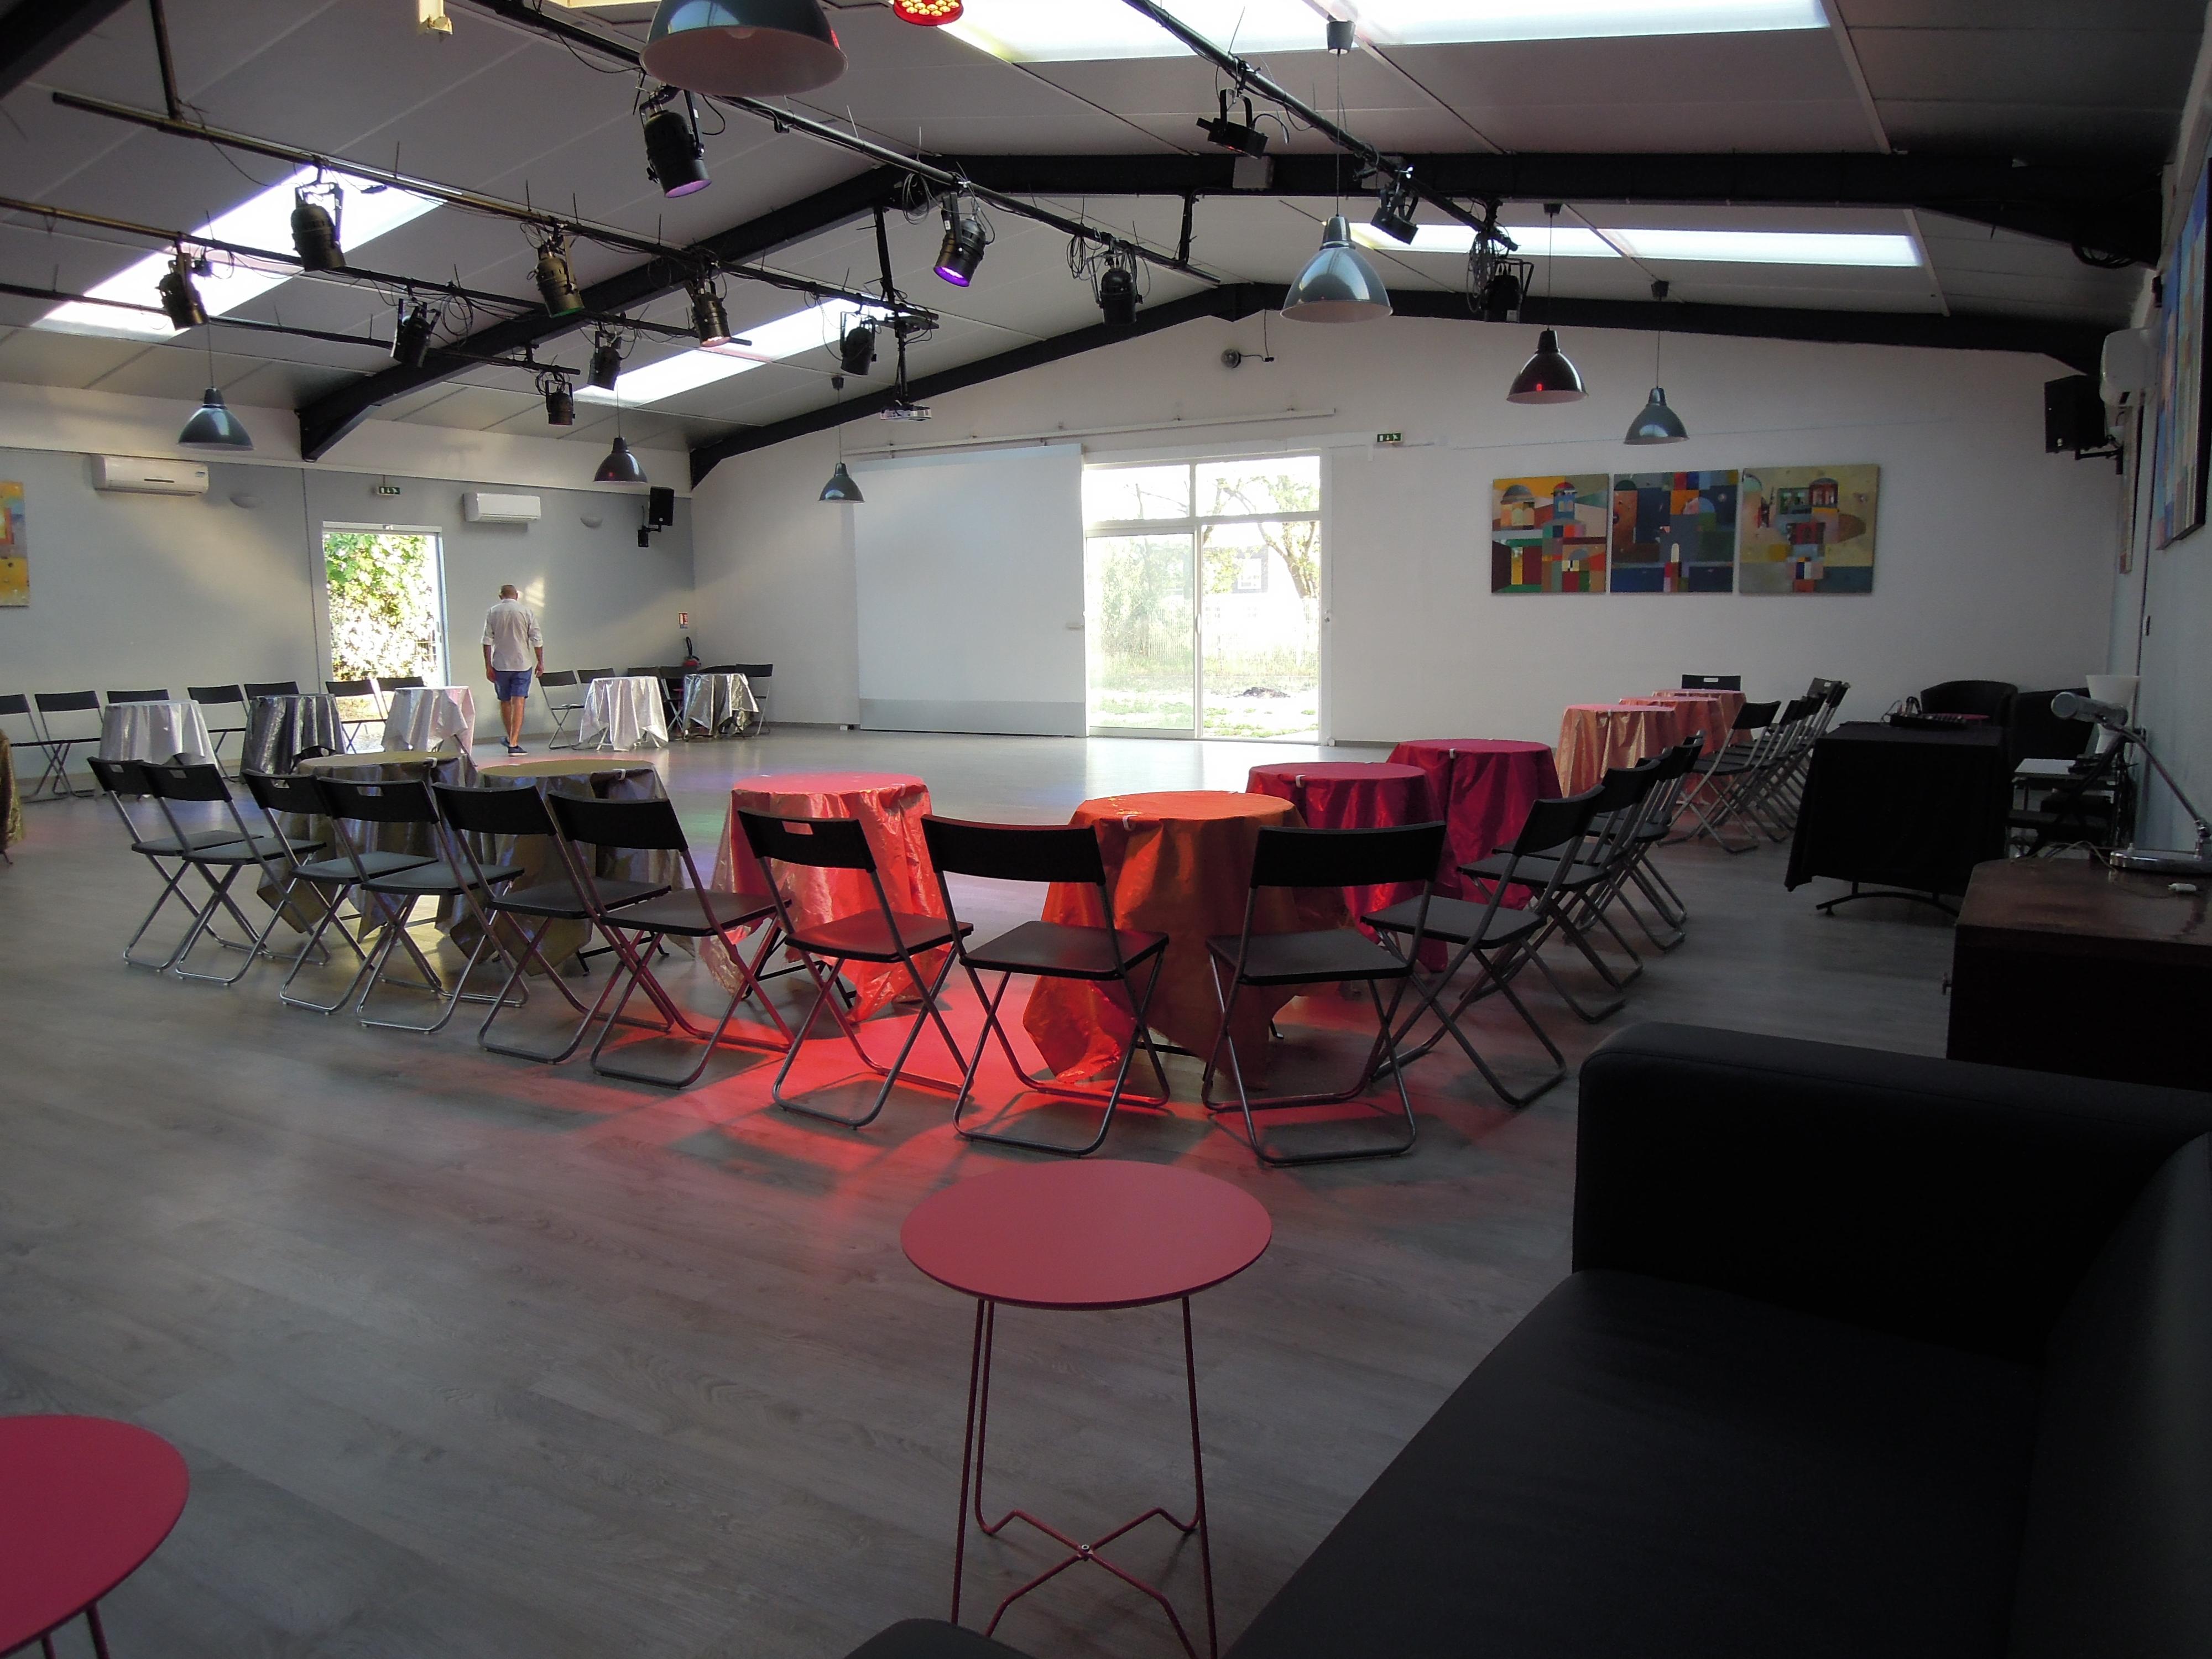 Dscn4422 el sal n de tango rufino luro cambaceres location salle de danse montpellier - Danse de salon montpellier ...